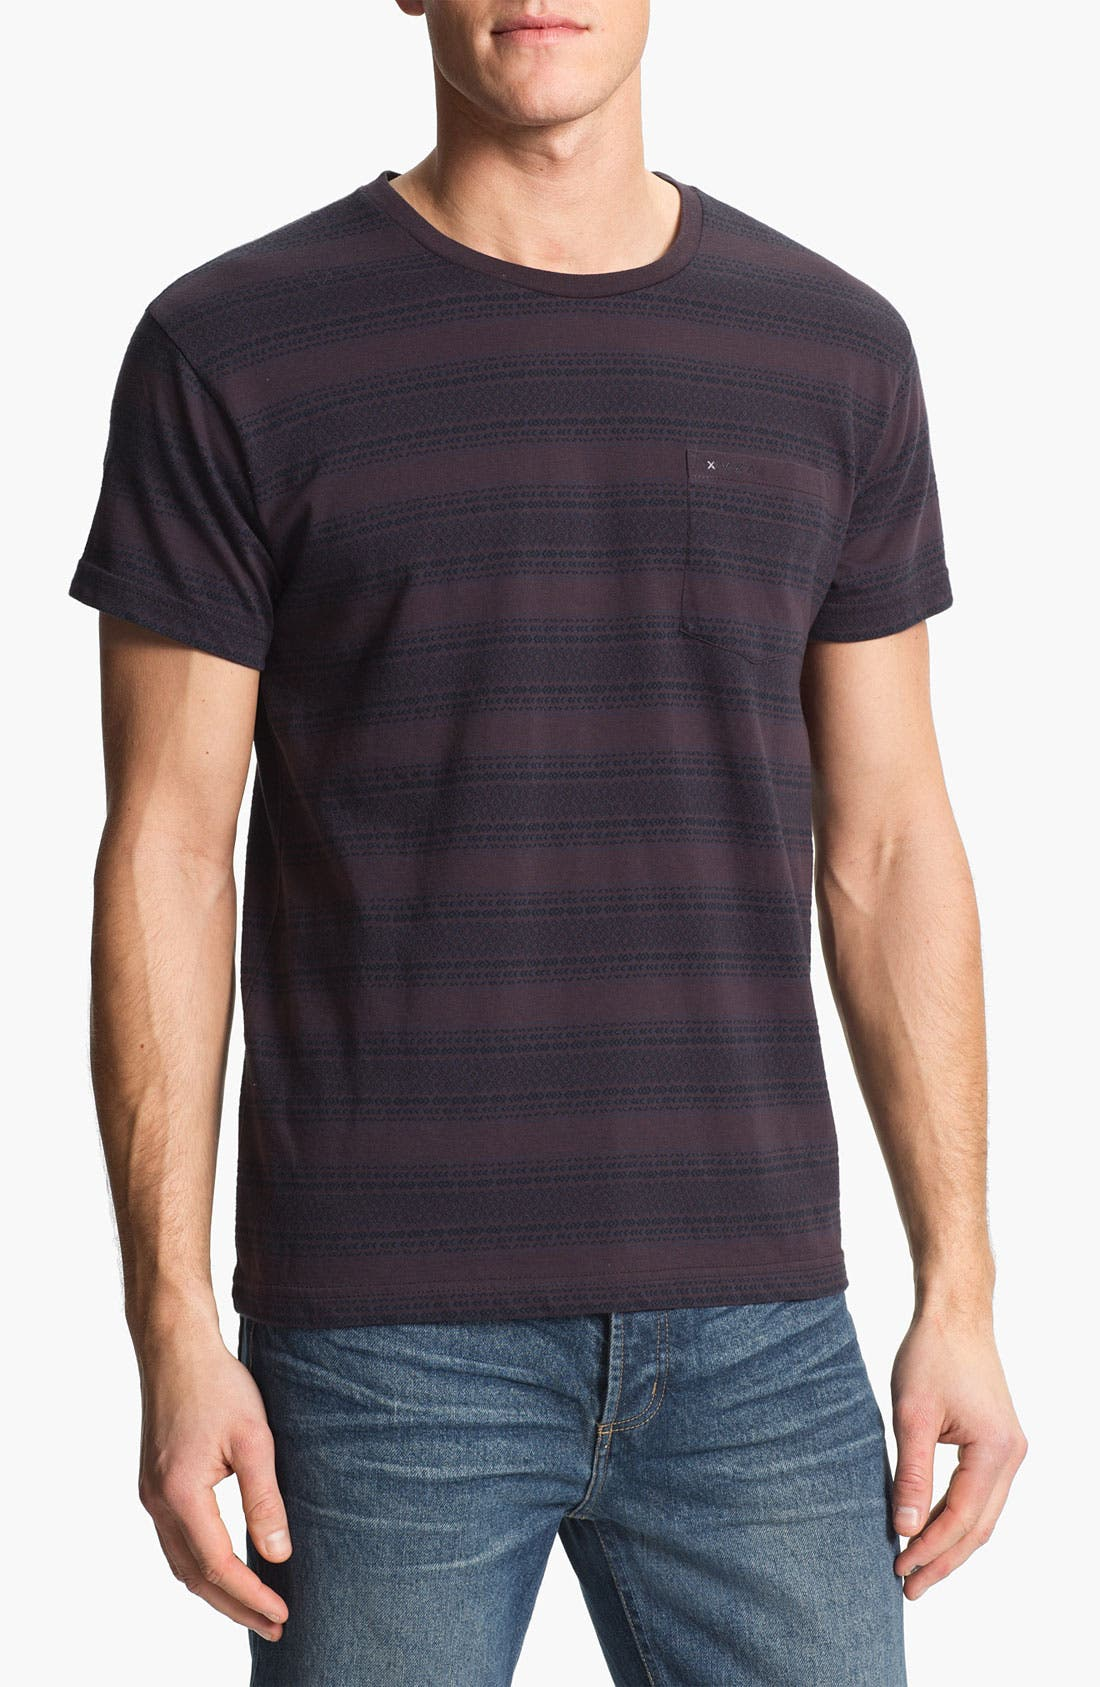 Main Image - RVCA 'Shaman' Stripe Crewneck T-Shirt